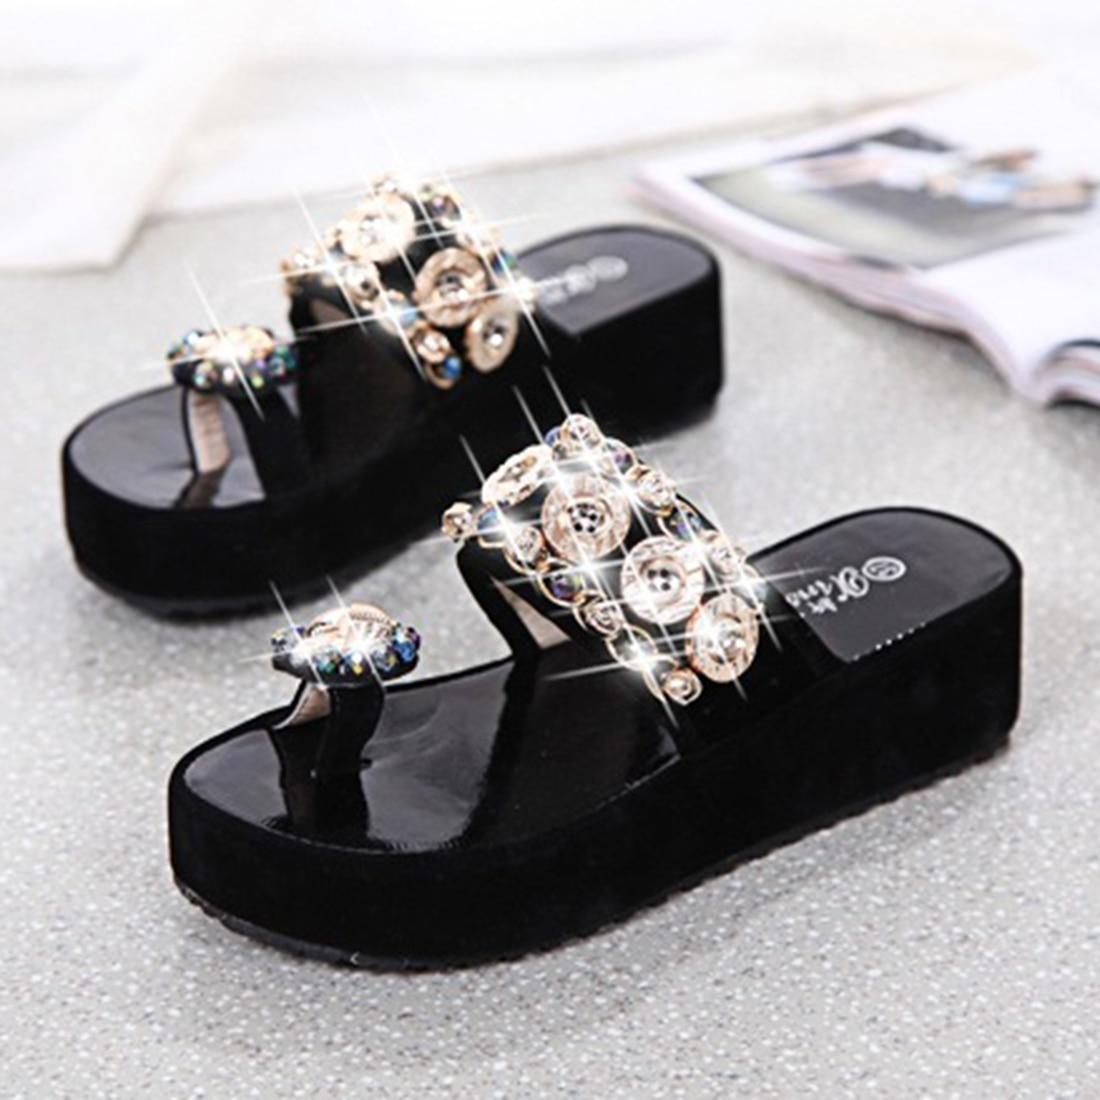 Black sandals rhinestones - Rhinestones Sandals Women Summer Platform Flip Flops Casual Beach Slippers Woman Slip On Black Sandals Wedge